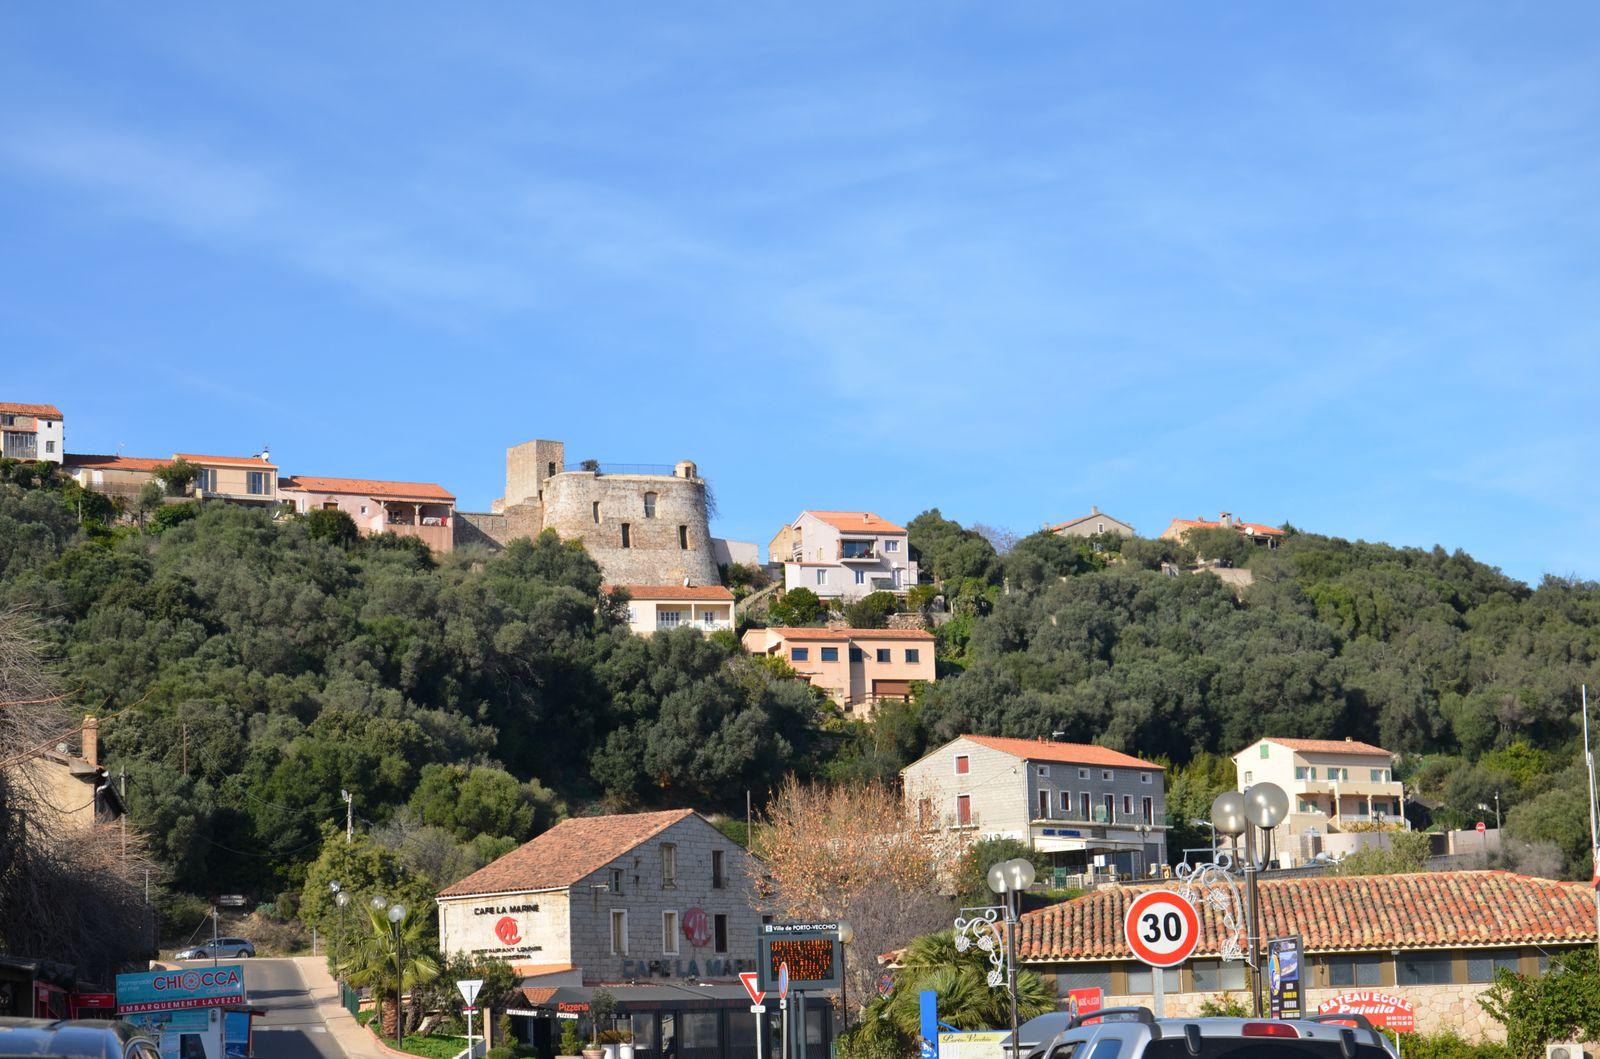 Porto-Vecchio 02A Corse du sud (Aires de camping-car)